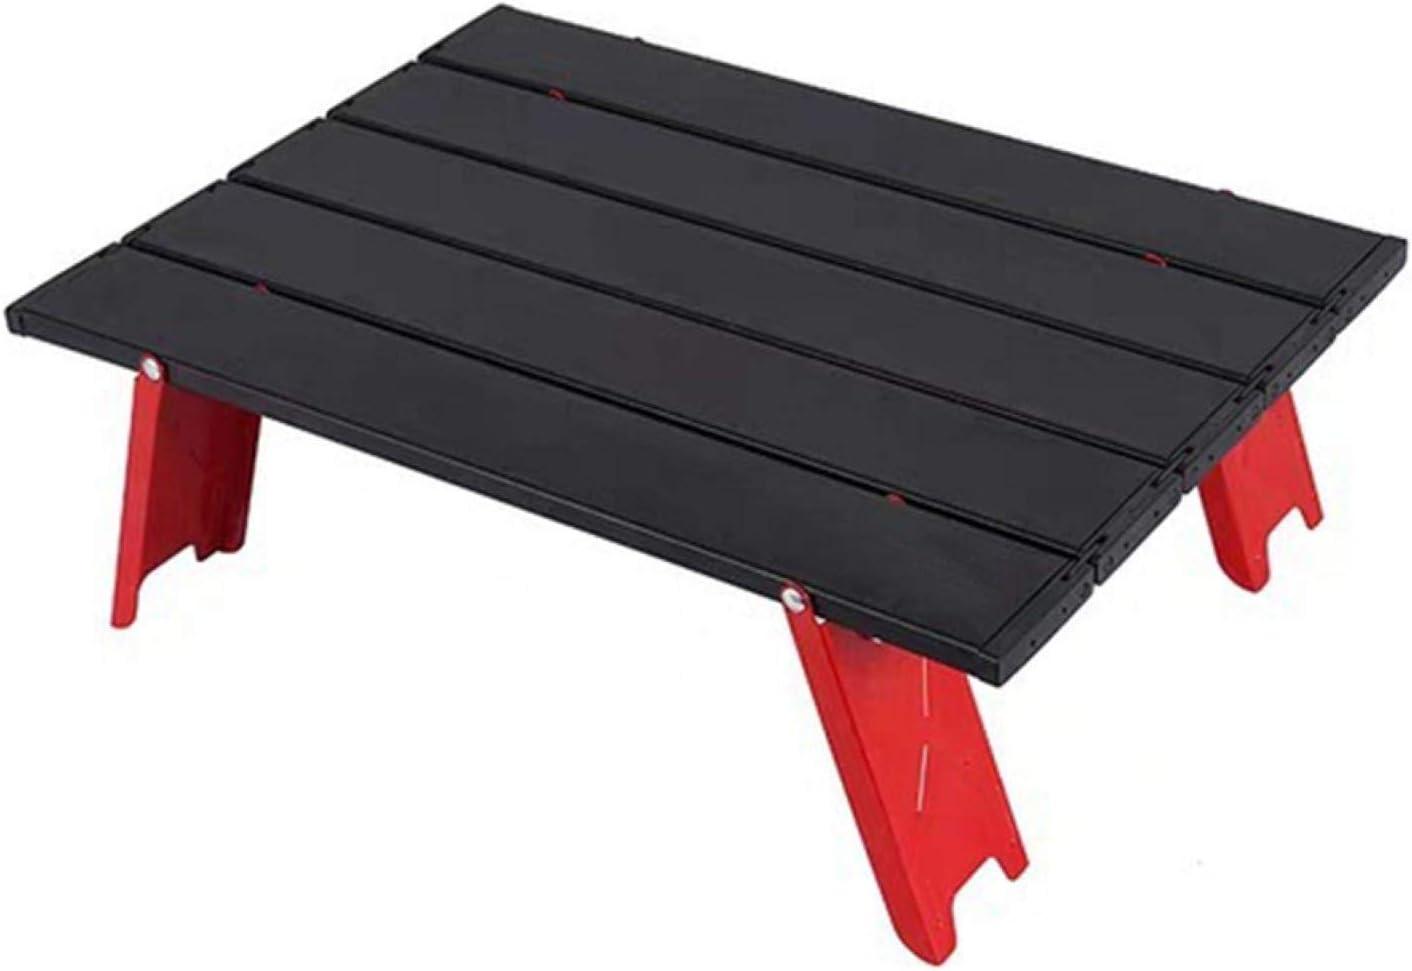 Portable Folding Compact Popular standard Tables Ultralight Beach Picnic 5 ☆ popular Fo Mini